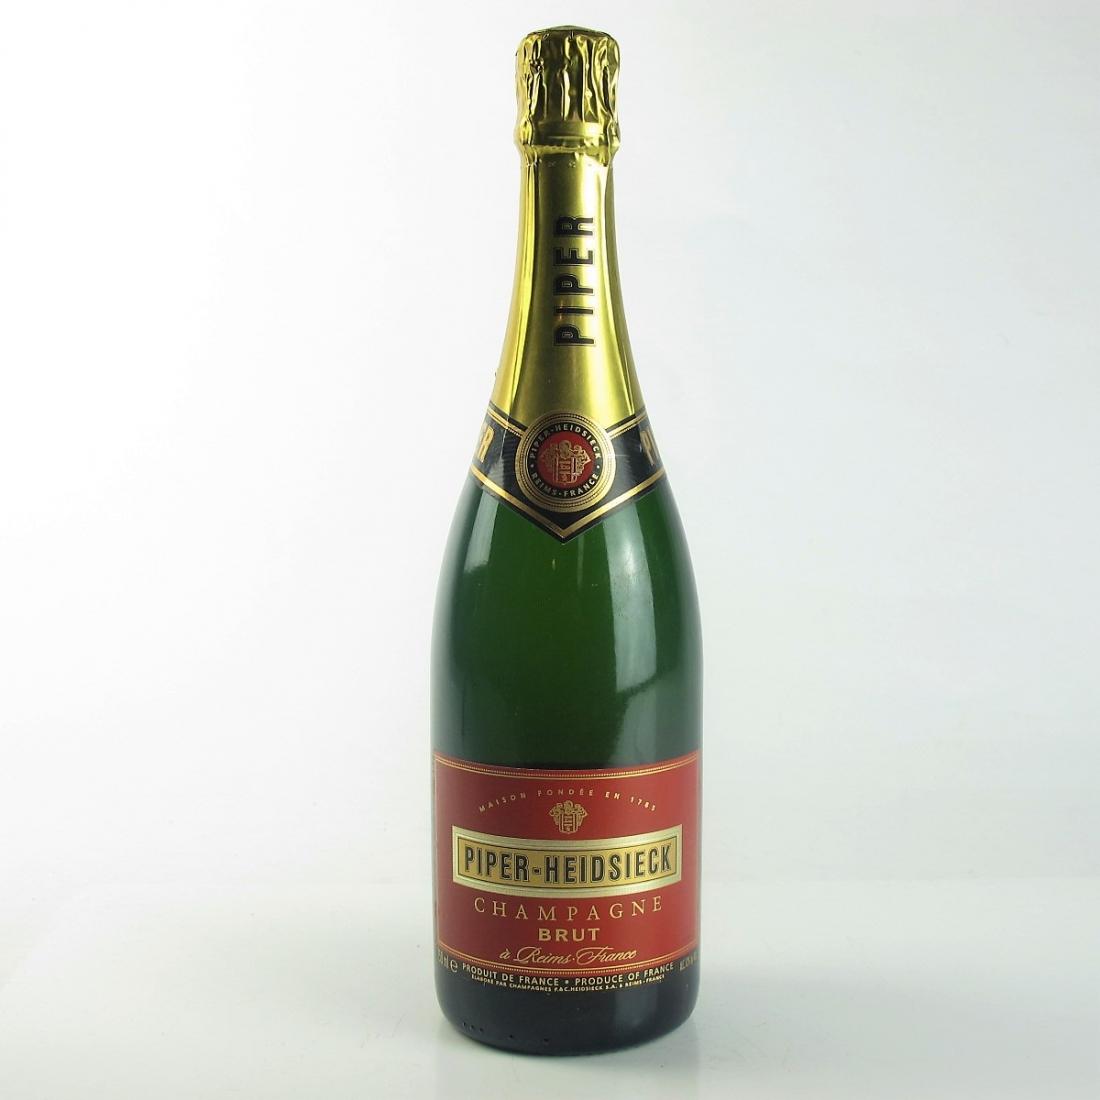 Piper Heidsieck Brut NV Champagne